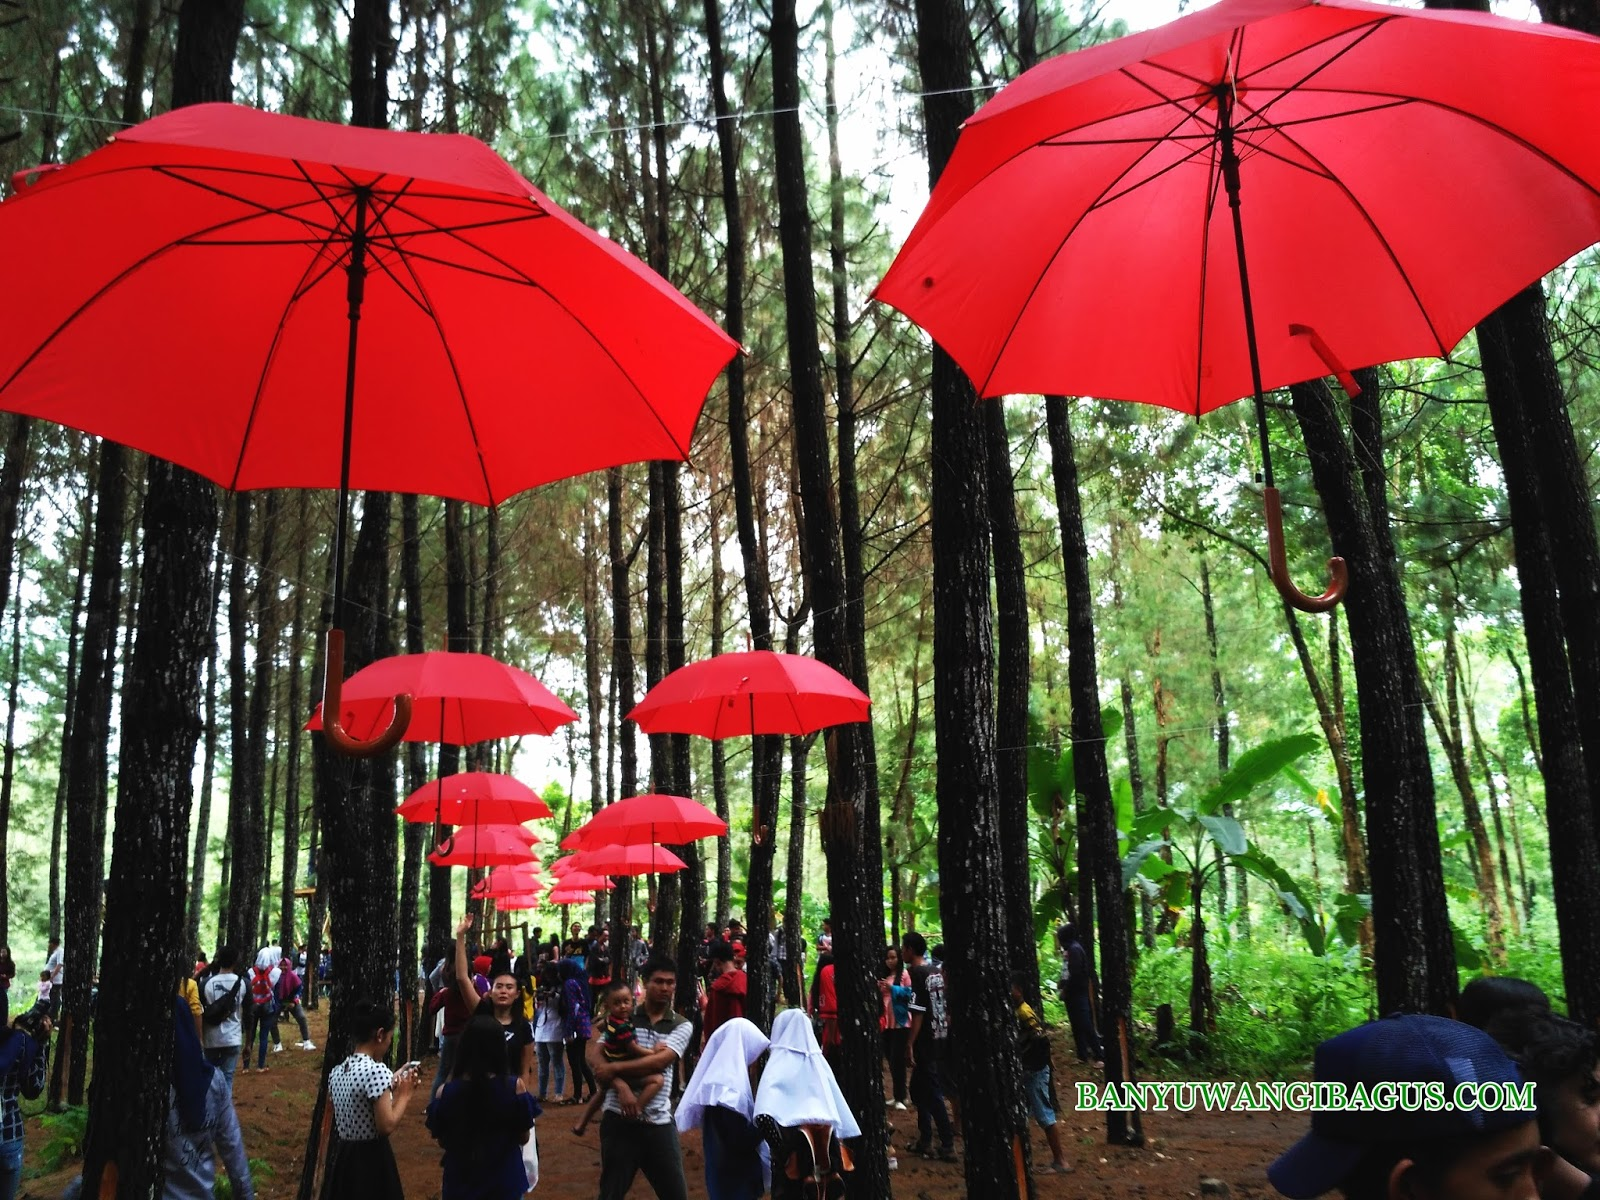 Wisata Hutan Pinus Songgon Spot Selfi Terkini Banyuwangi Rumah Dalem